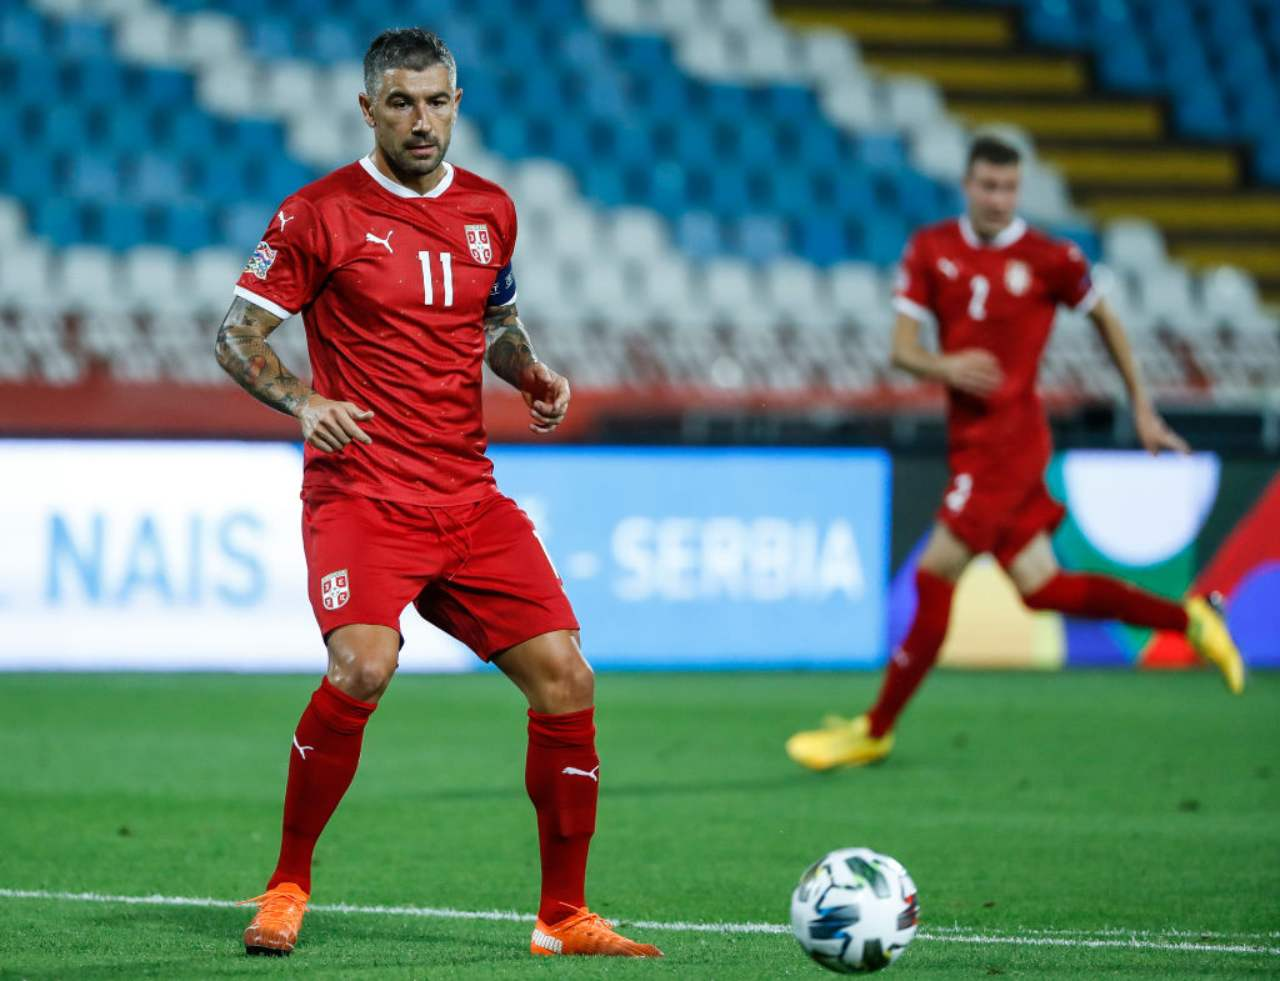 Aleksandar Kolarov è pronto ad iniziare l'avventura all'Inter (Getty Images)